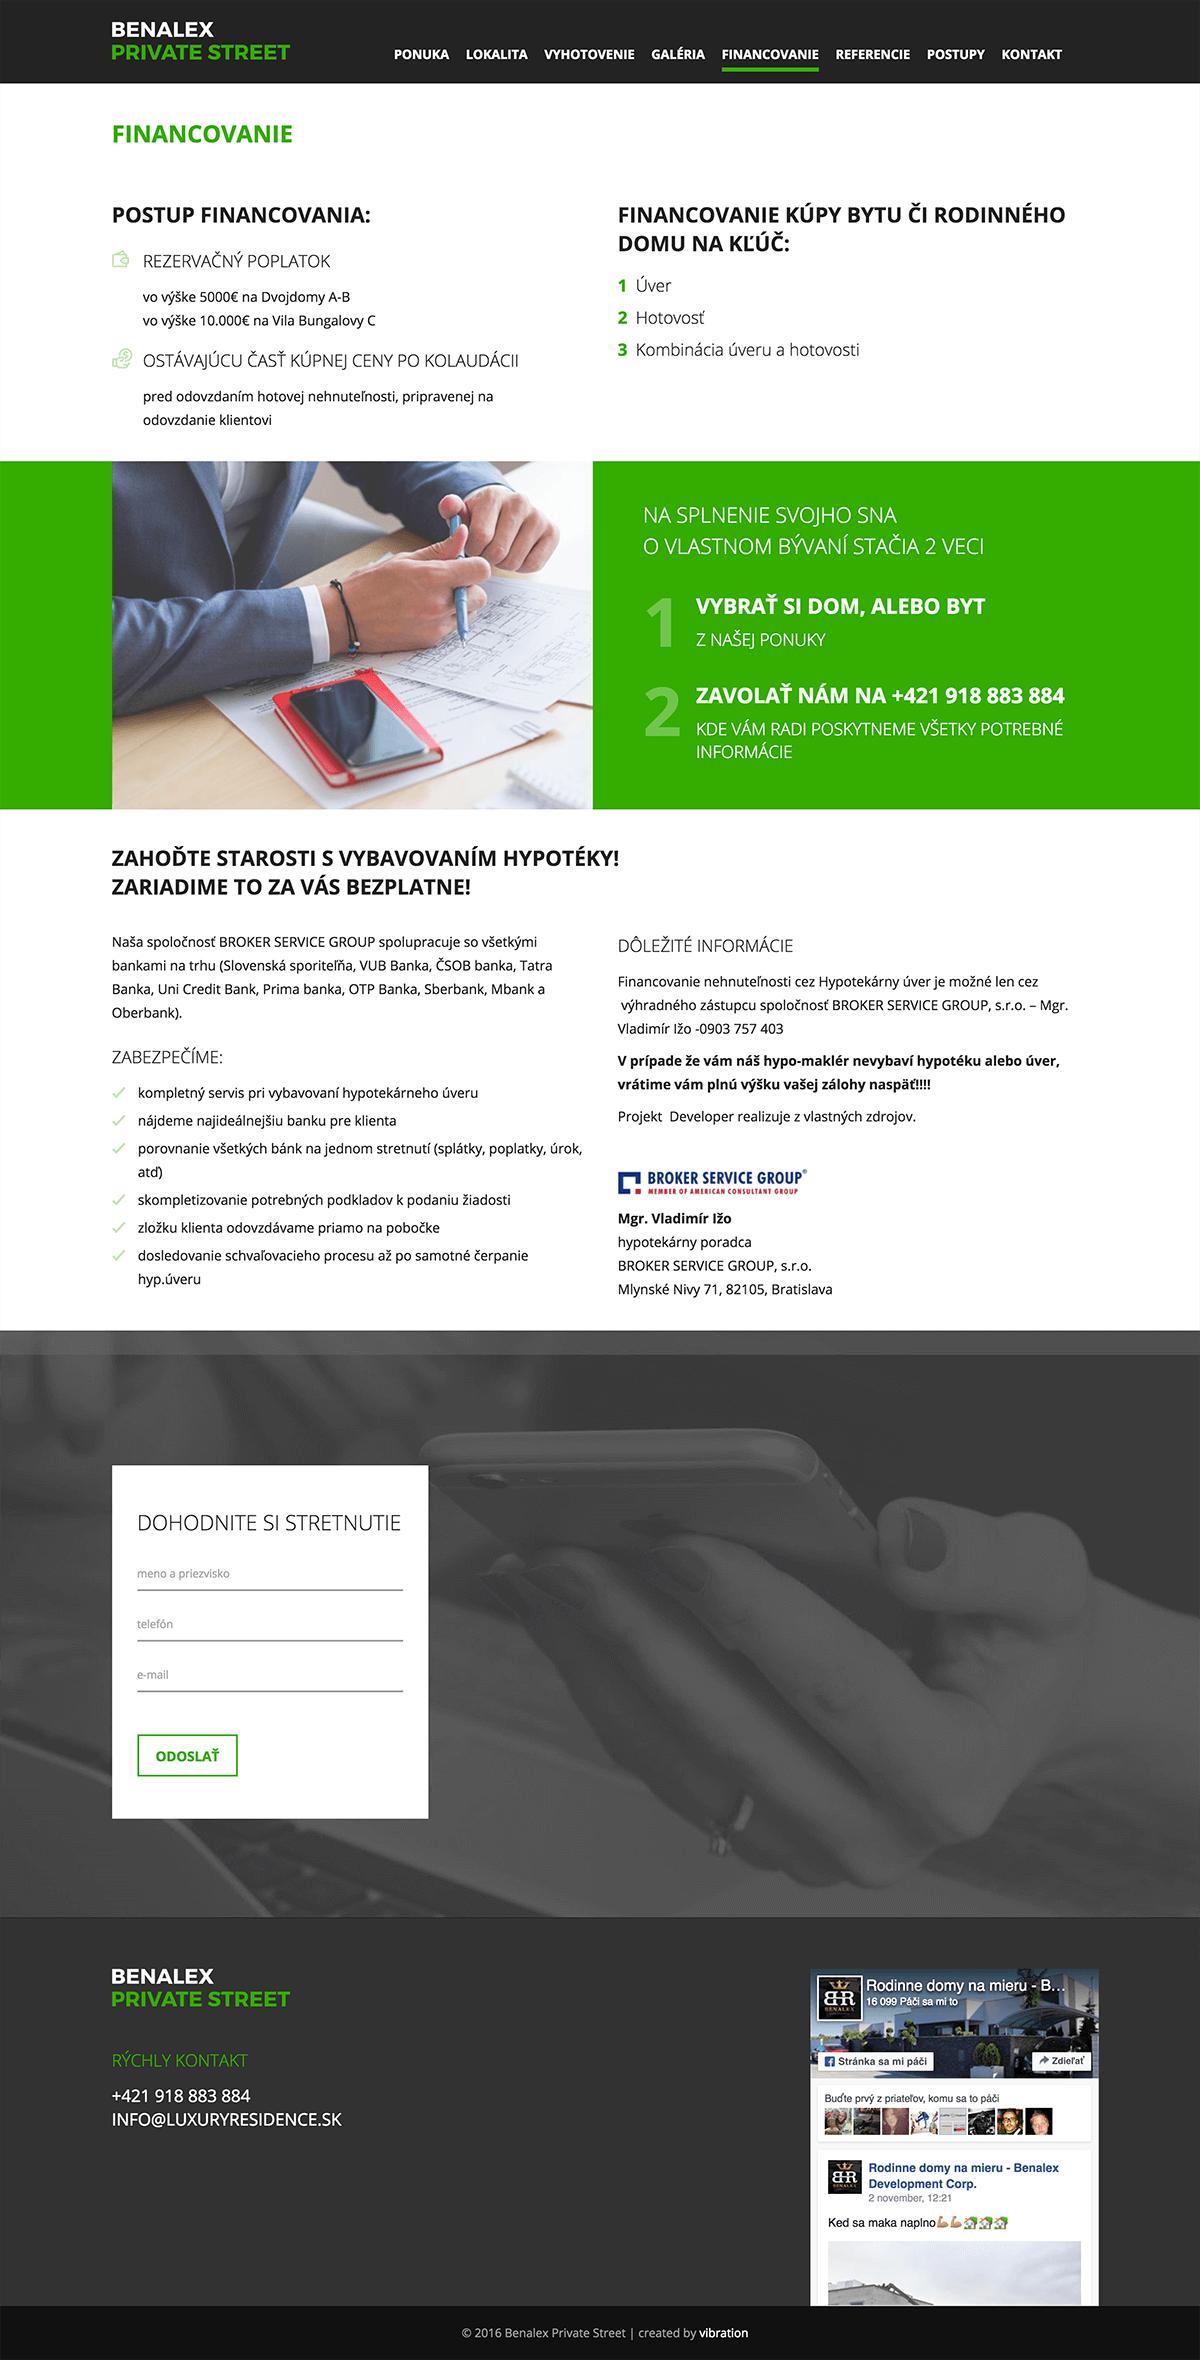 benalexprivatestreet-sk-financovanie